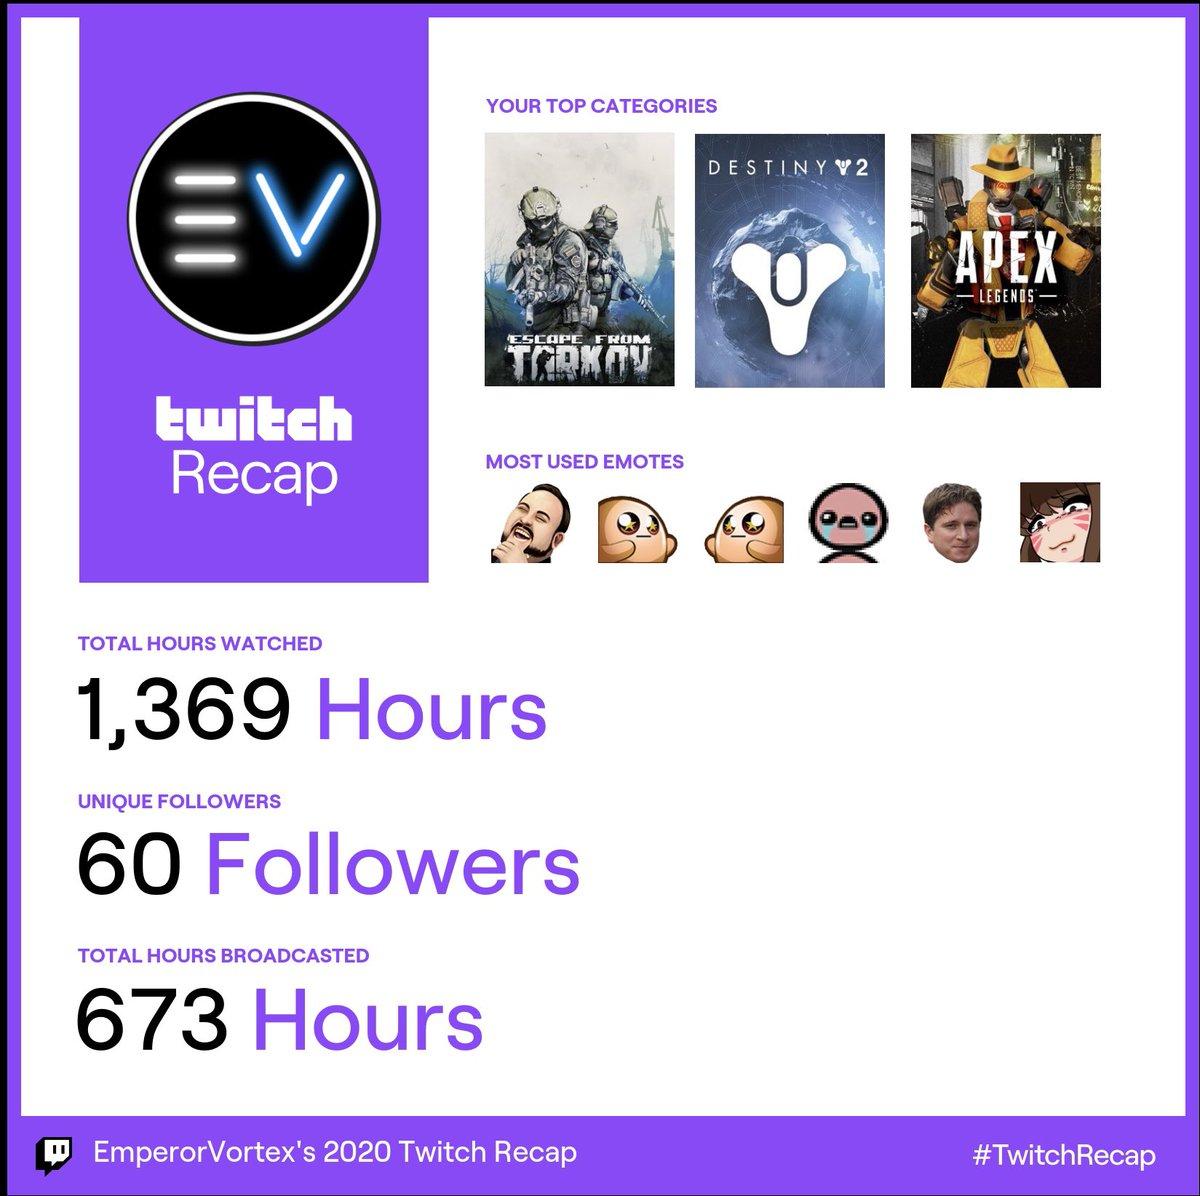 Got my @Twitch #TwitchRecap. This is just the beginning...